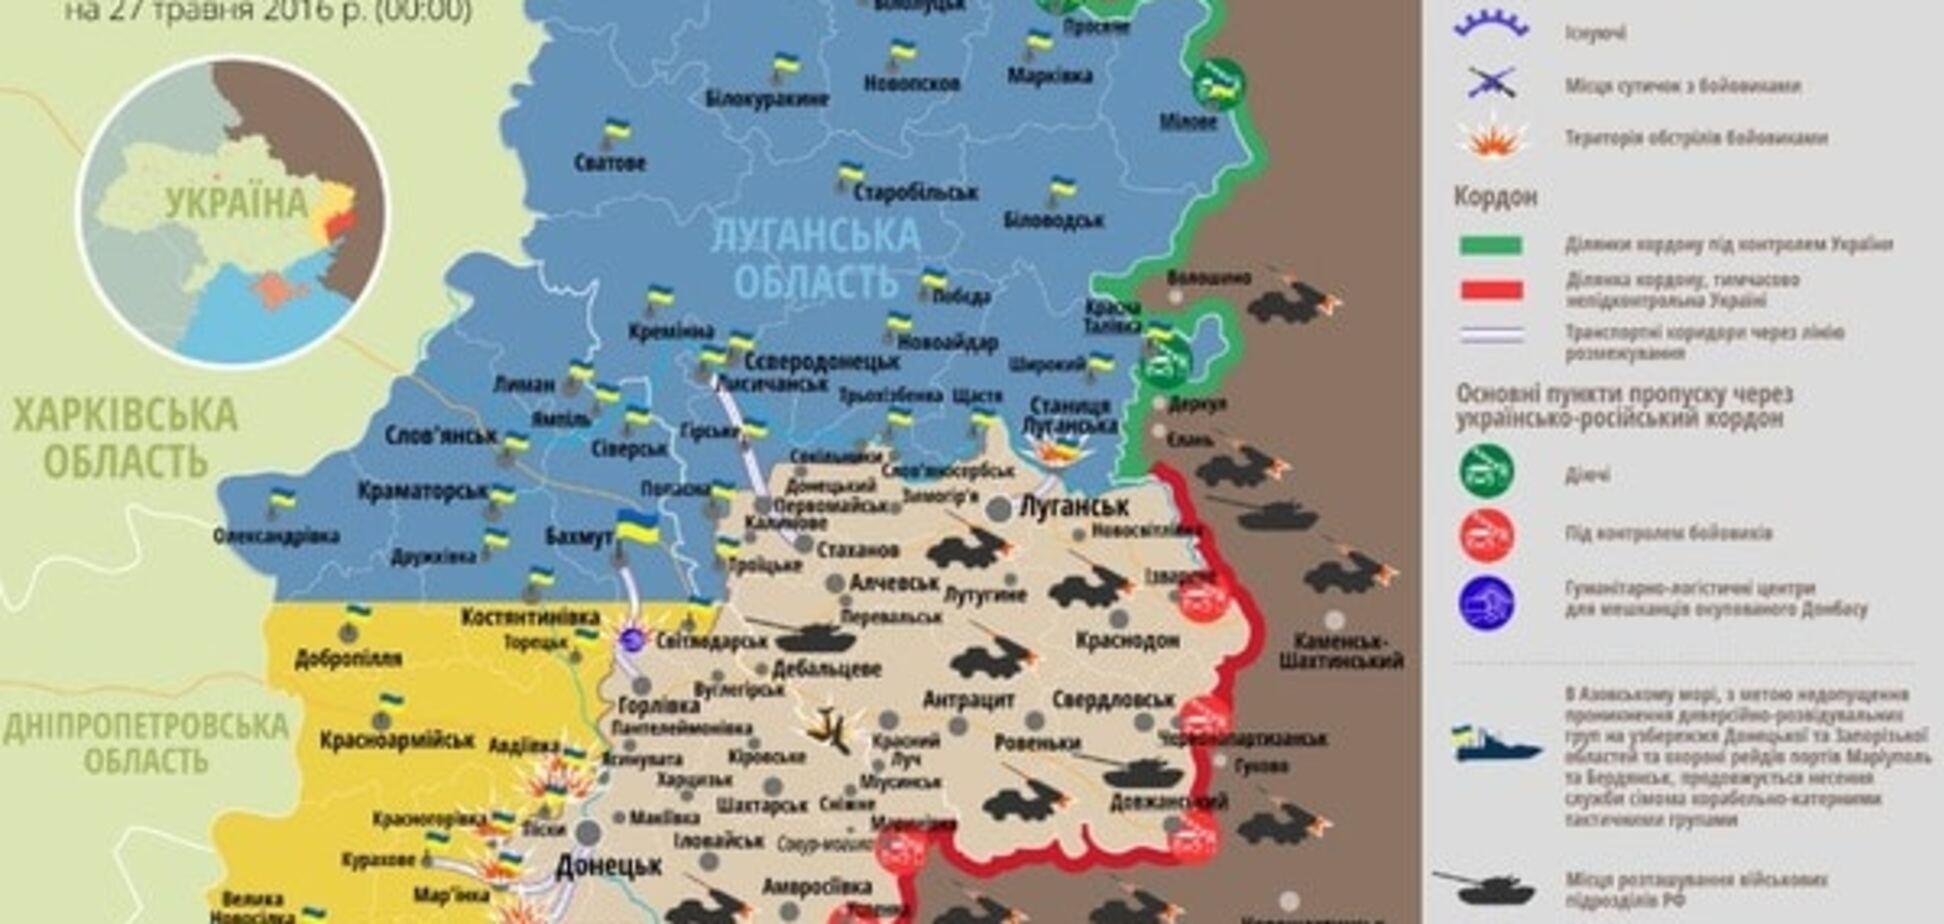 14 украинских бойцов получили ранения на Донбассе: карта АТО